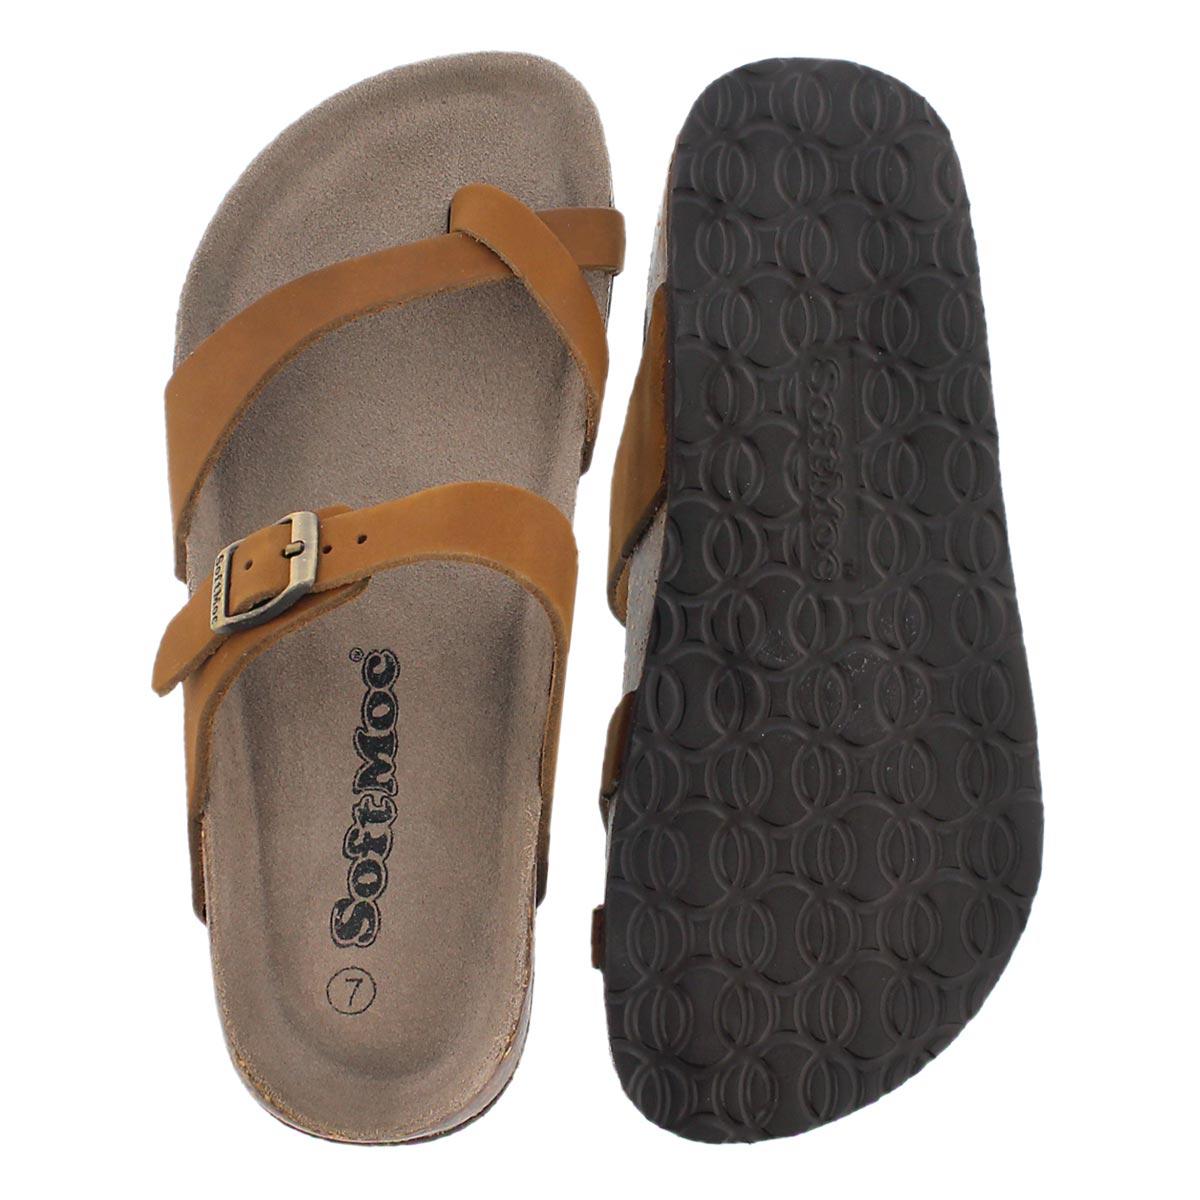 Sandale ALICIA 3, havane, femmes